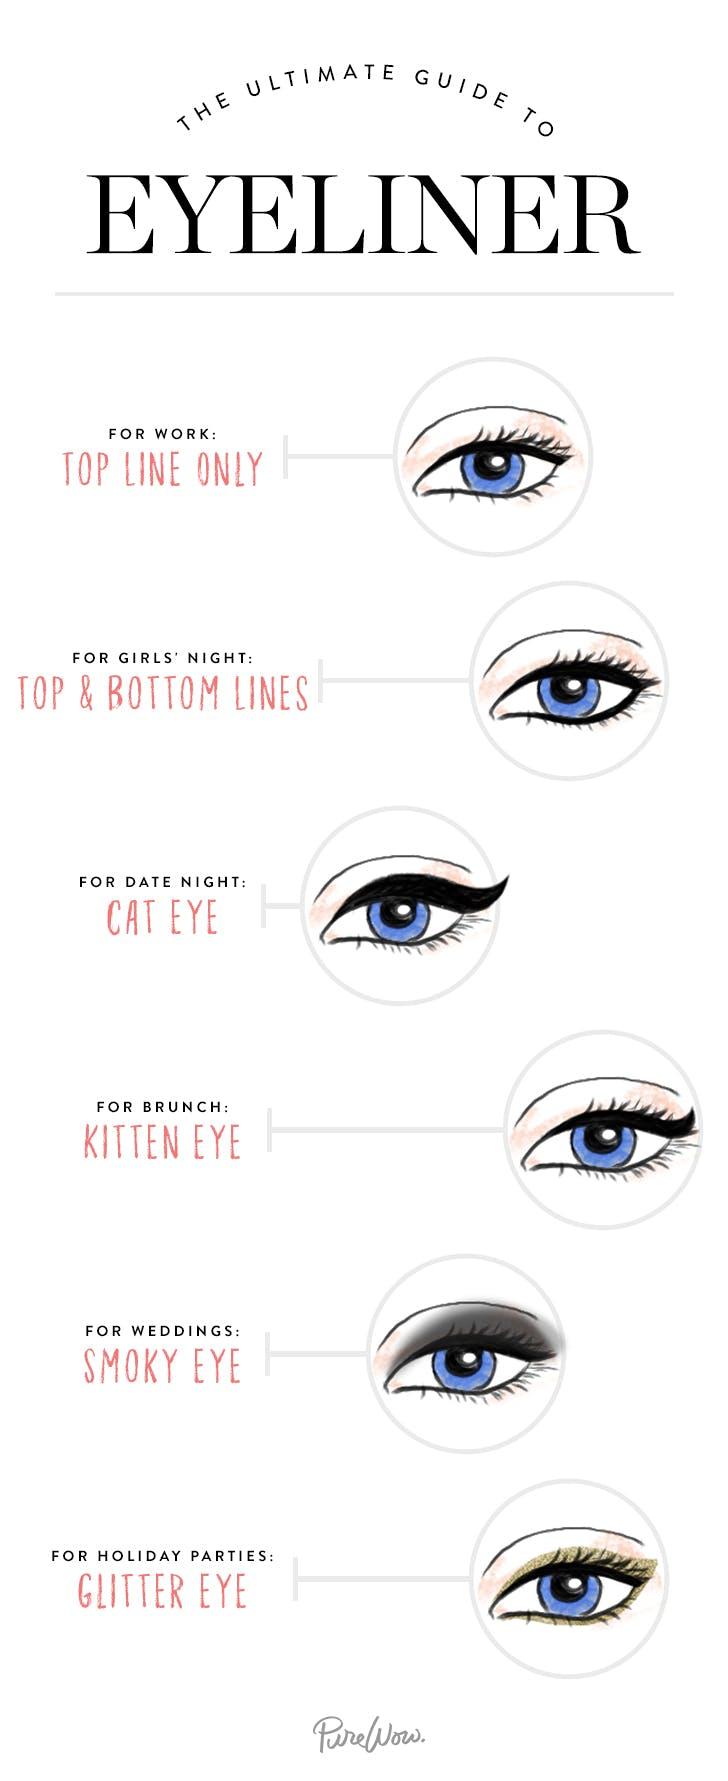 Eyeliner Infographic1